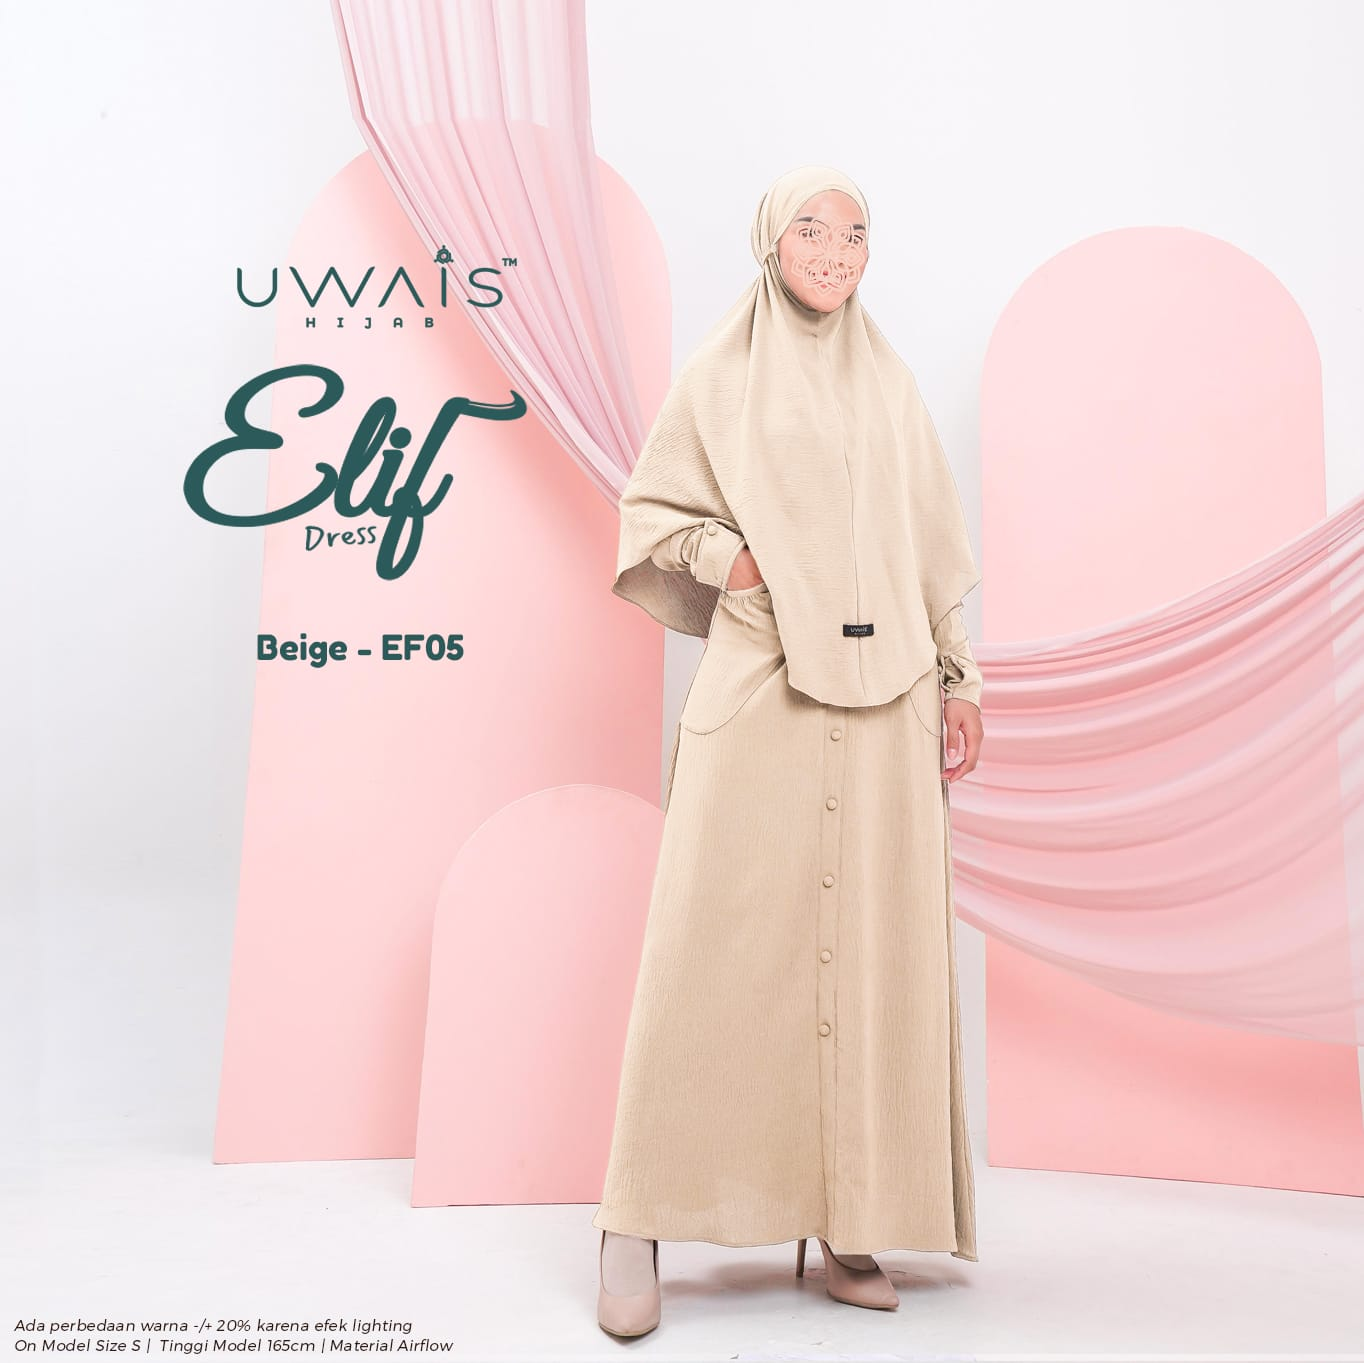 elif_dress_beige